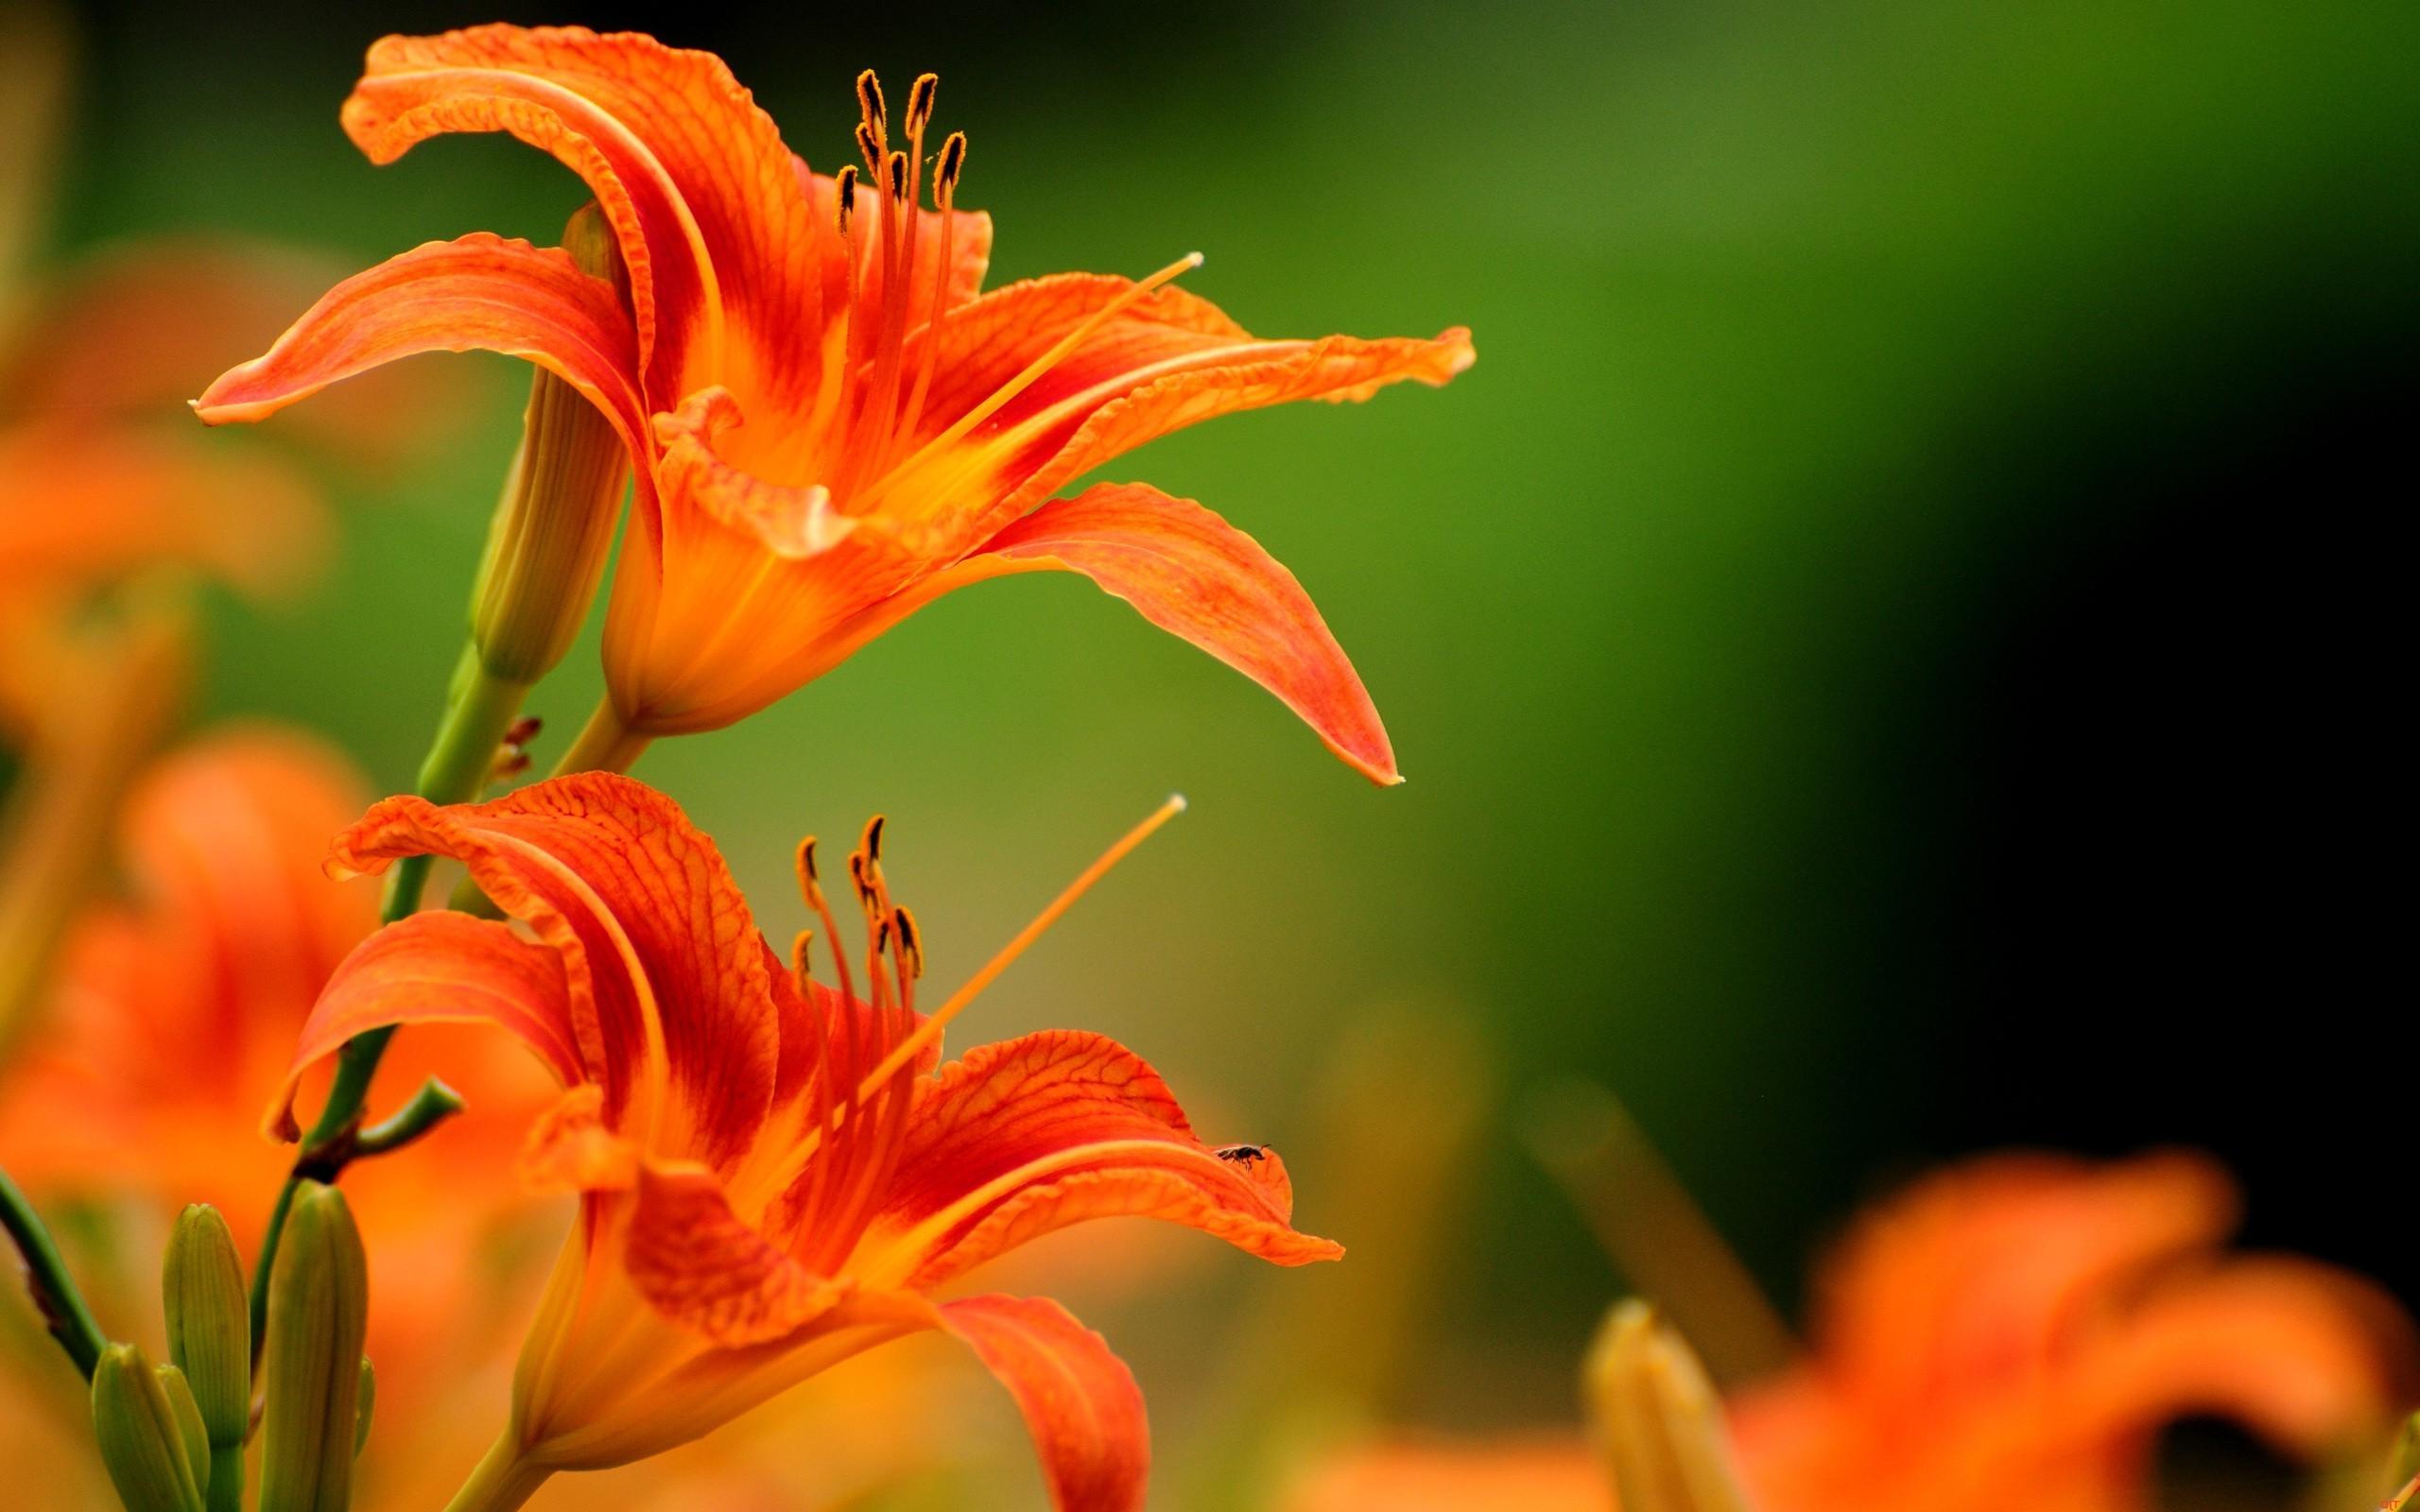 Wallpaper 2560x1600 Px Lilies Orange Flowers 2560x1600 Goodfon